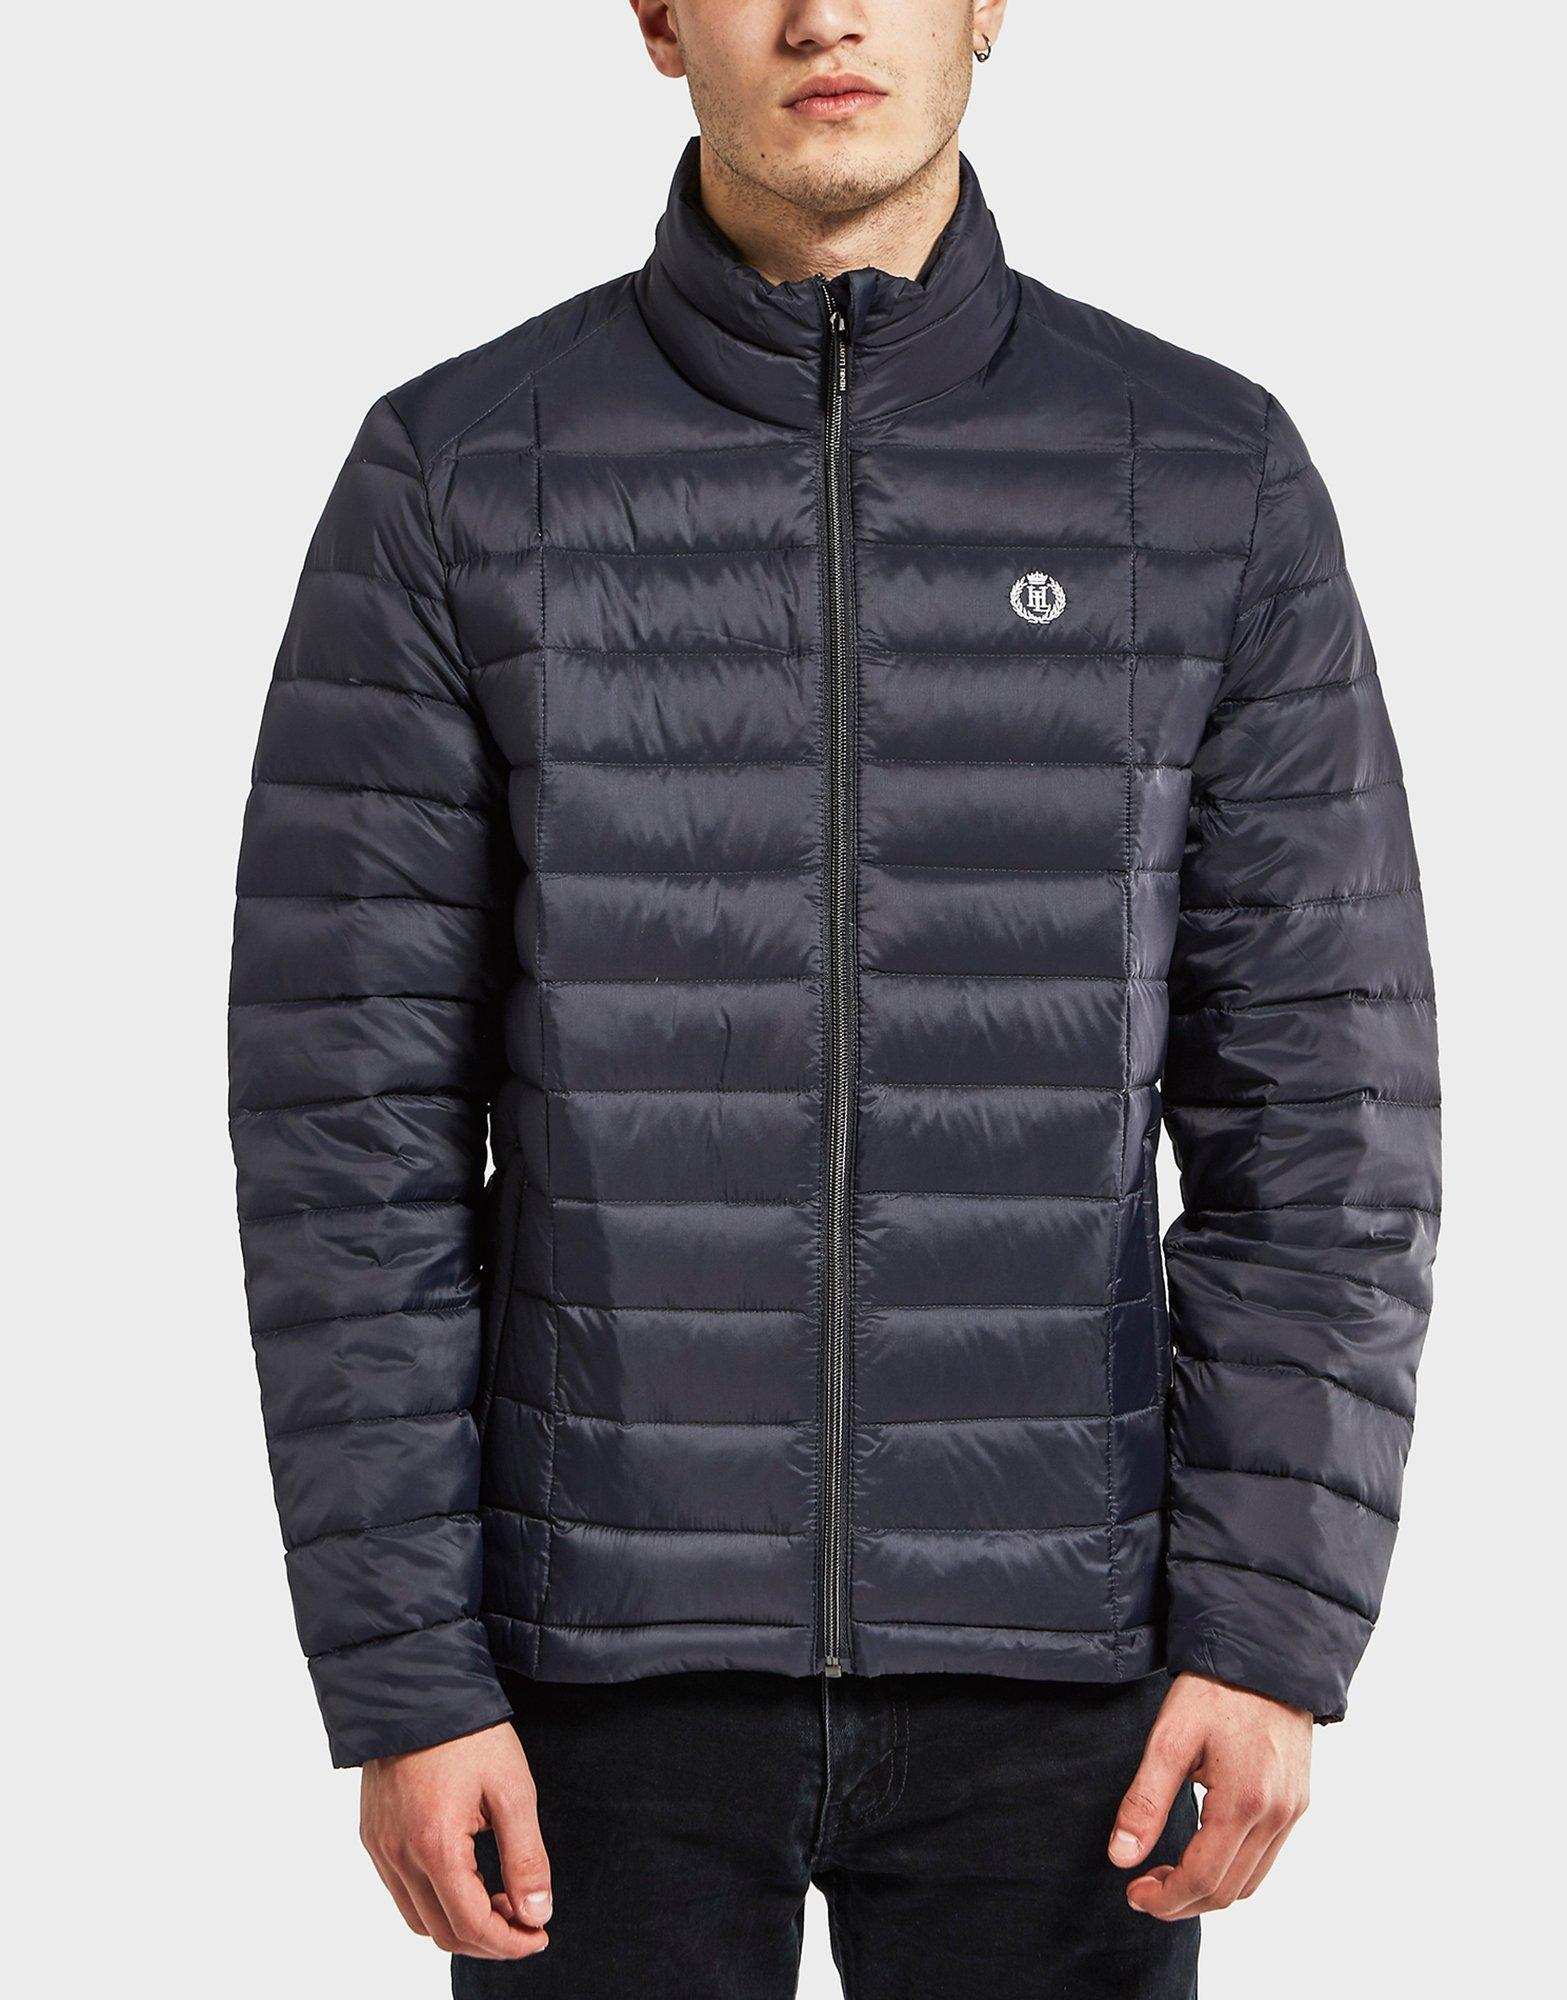 Henri lloyd jacket with hood